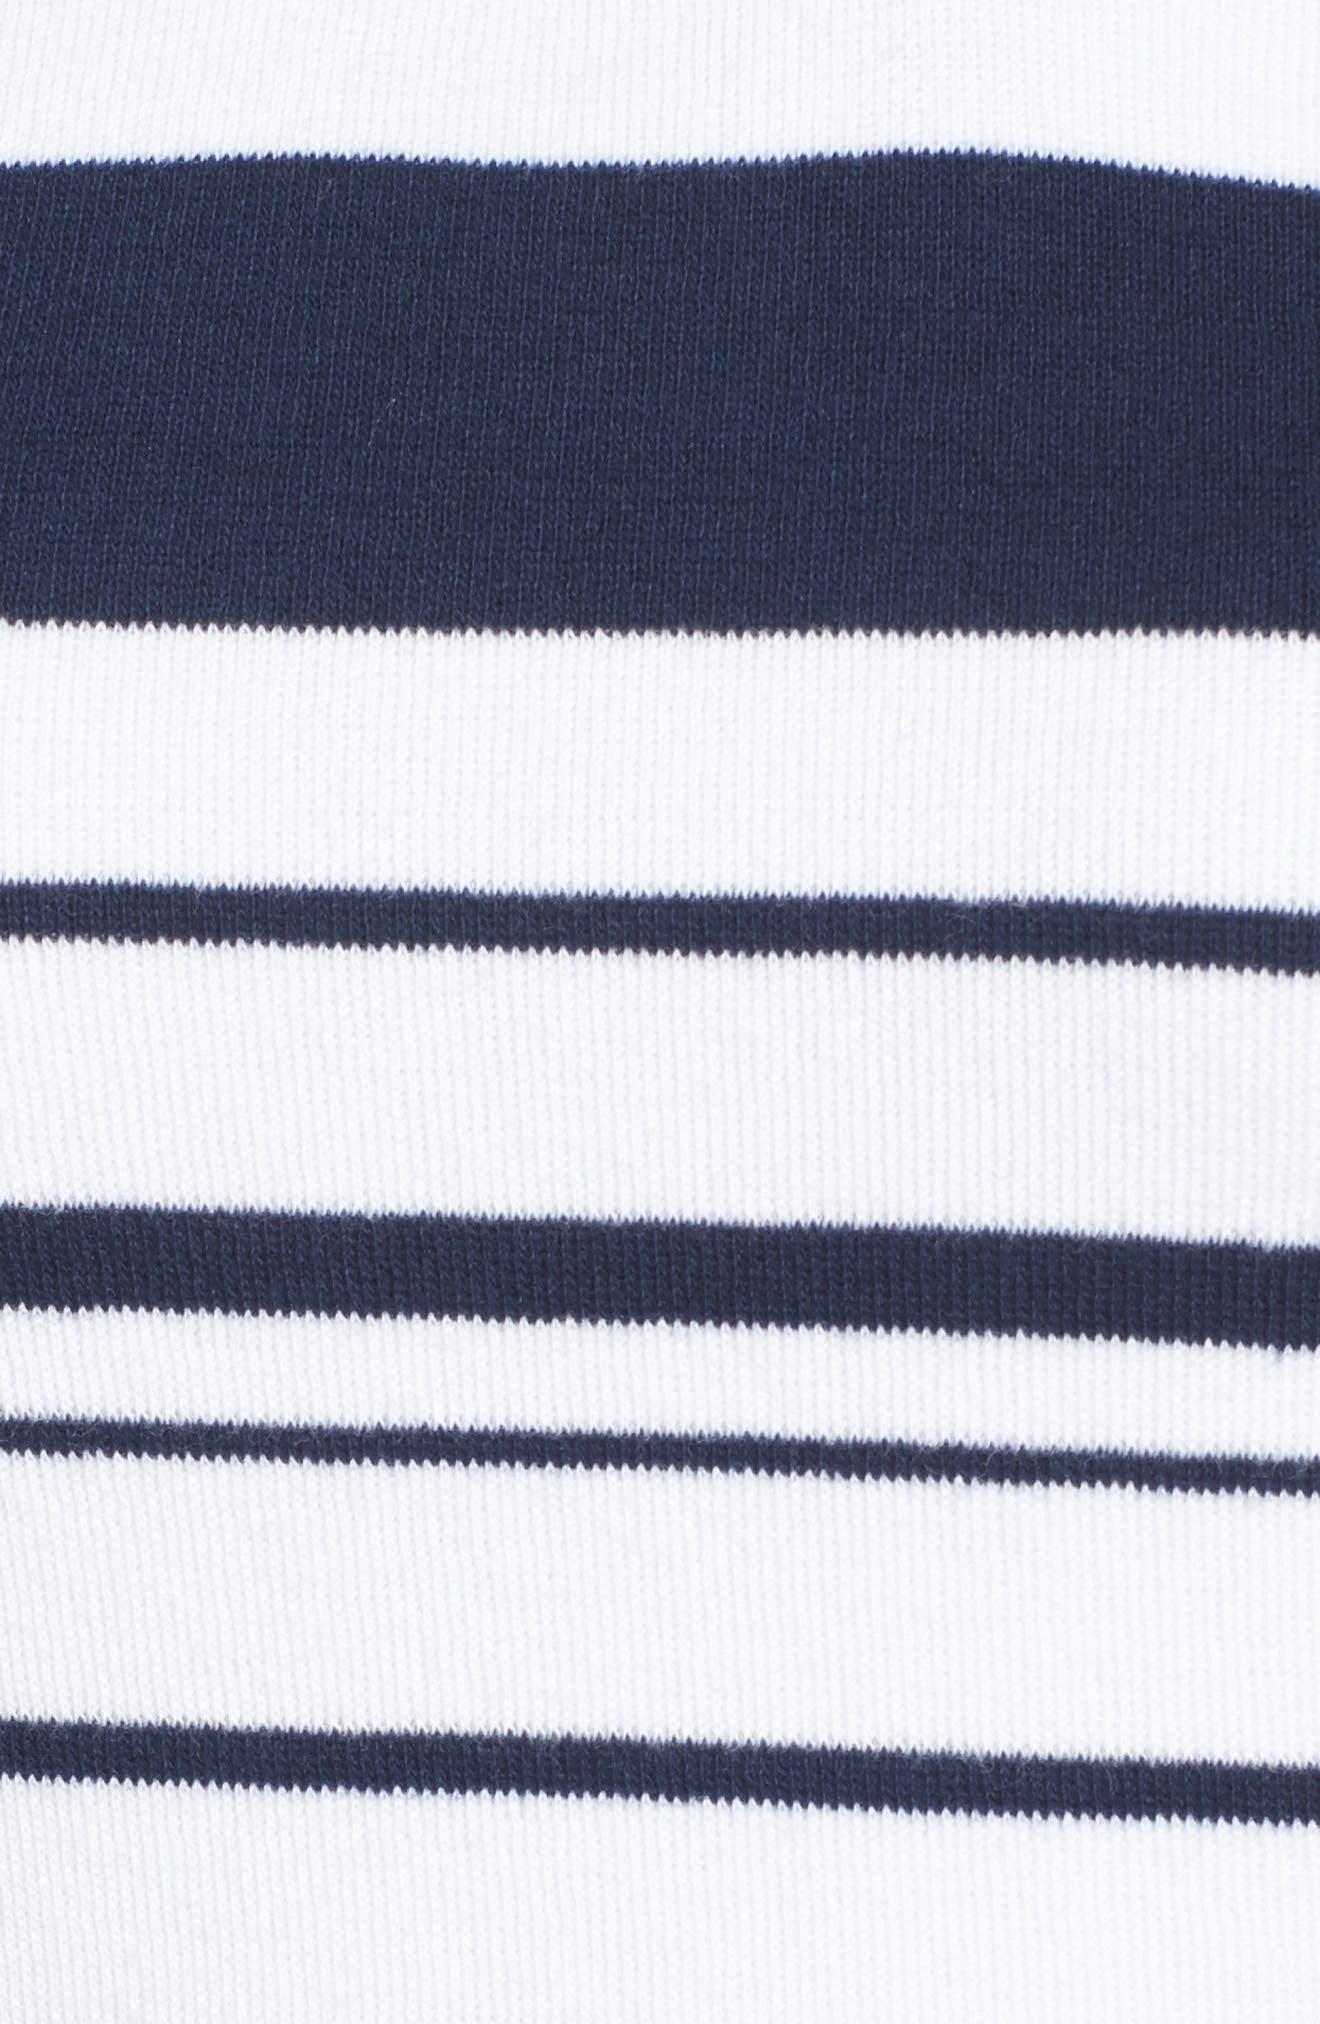 TOMMY BAHAMA,                             Aruba Stripe Hoodie,                             Alternate thumbnail 5, color,                             400